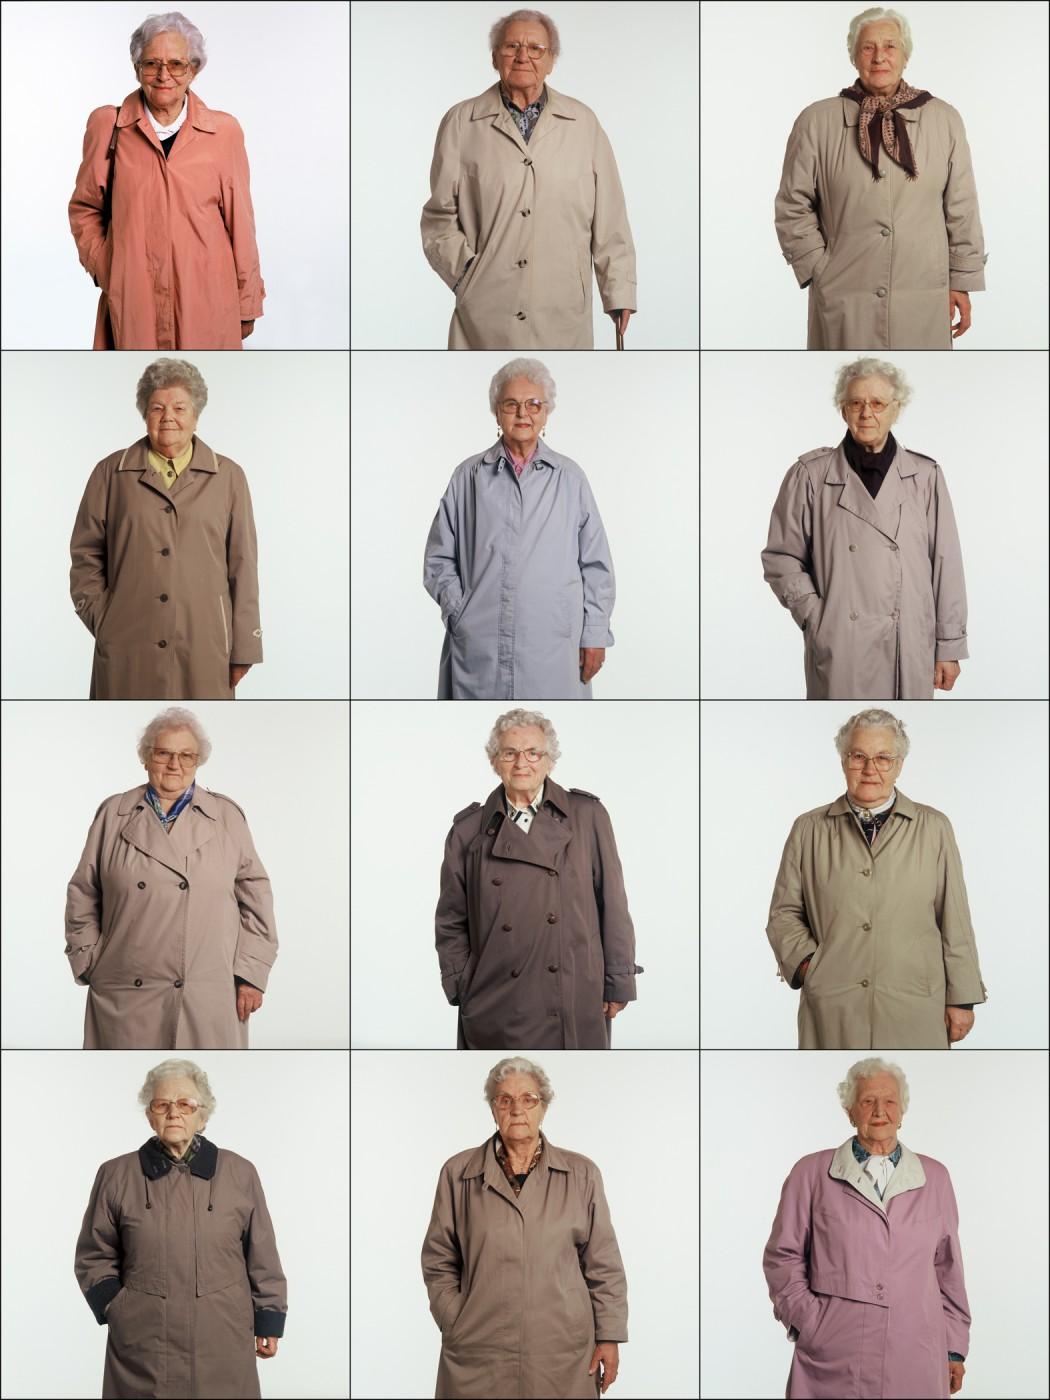 Ari Versluis &amp;amp; Ellie Uyttenbroek, </span><span><em>Exactitudes, 25. Grannies - Rotterdam 1998</em>